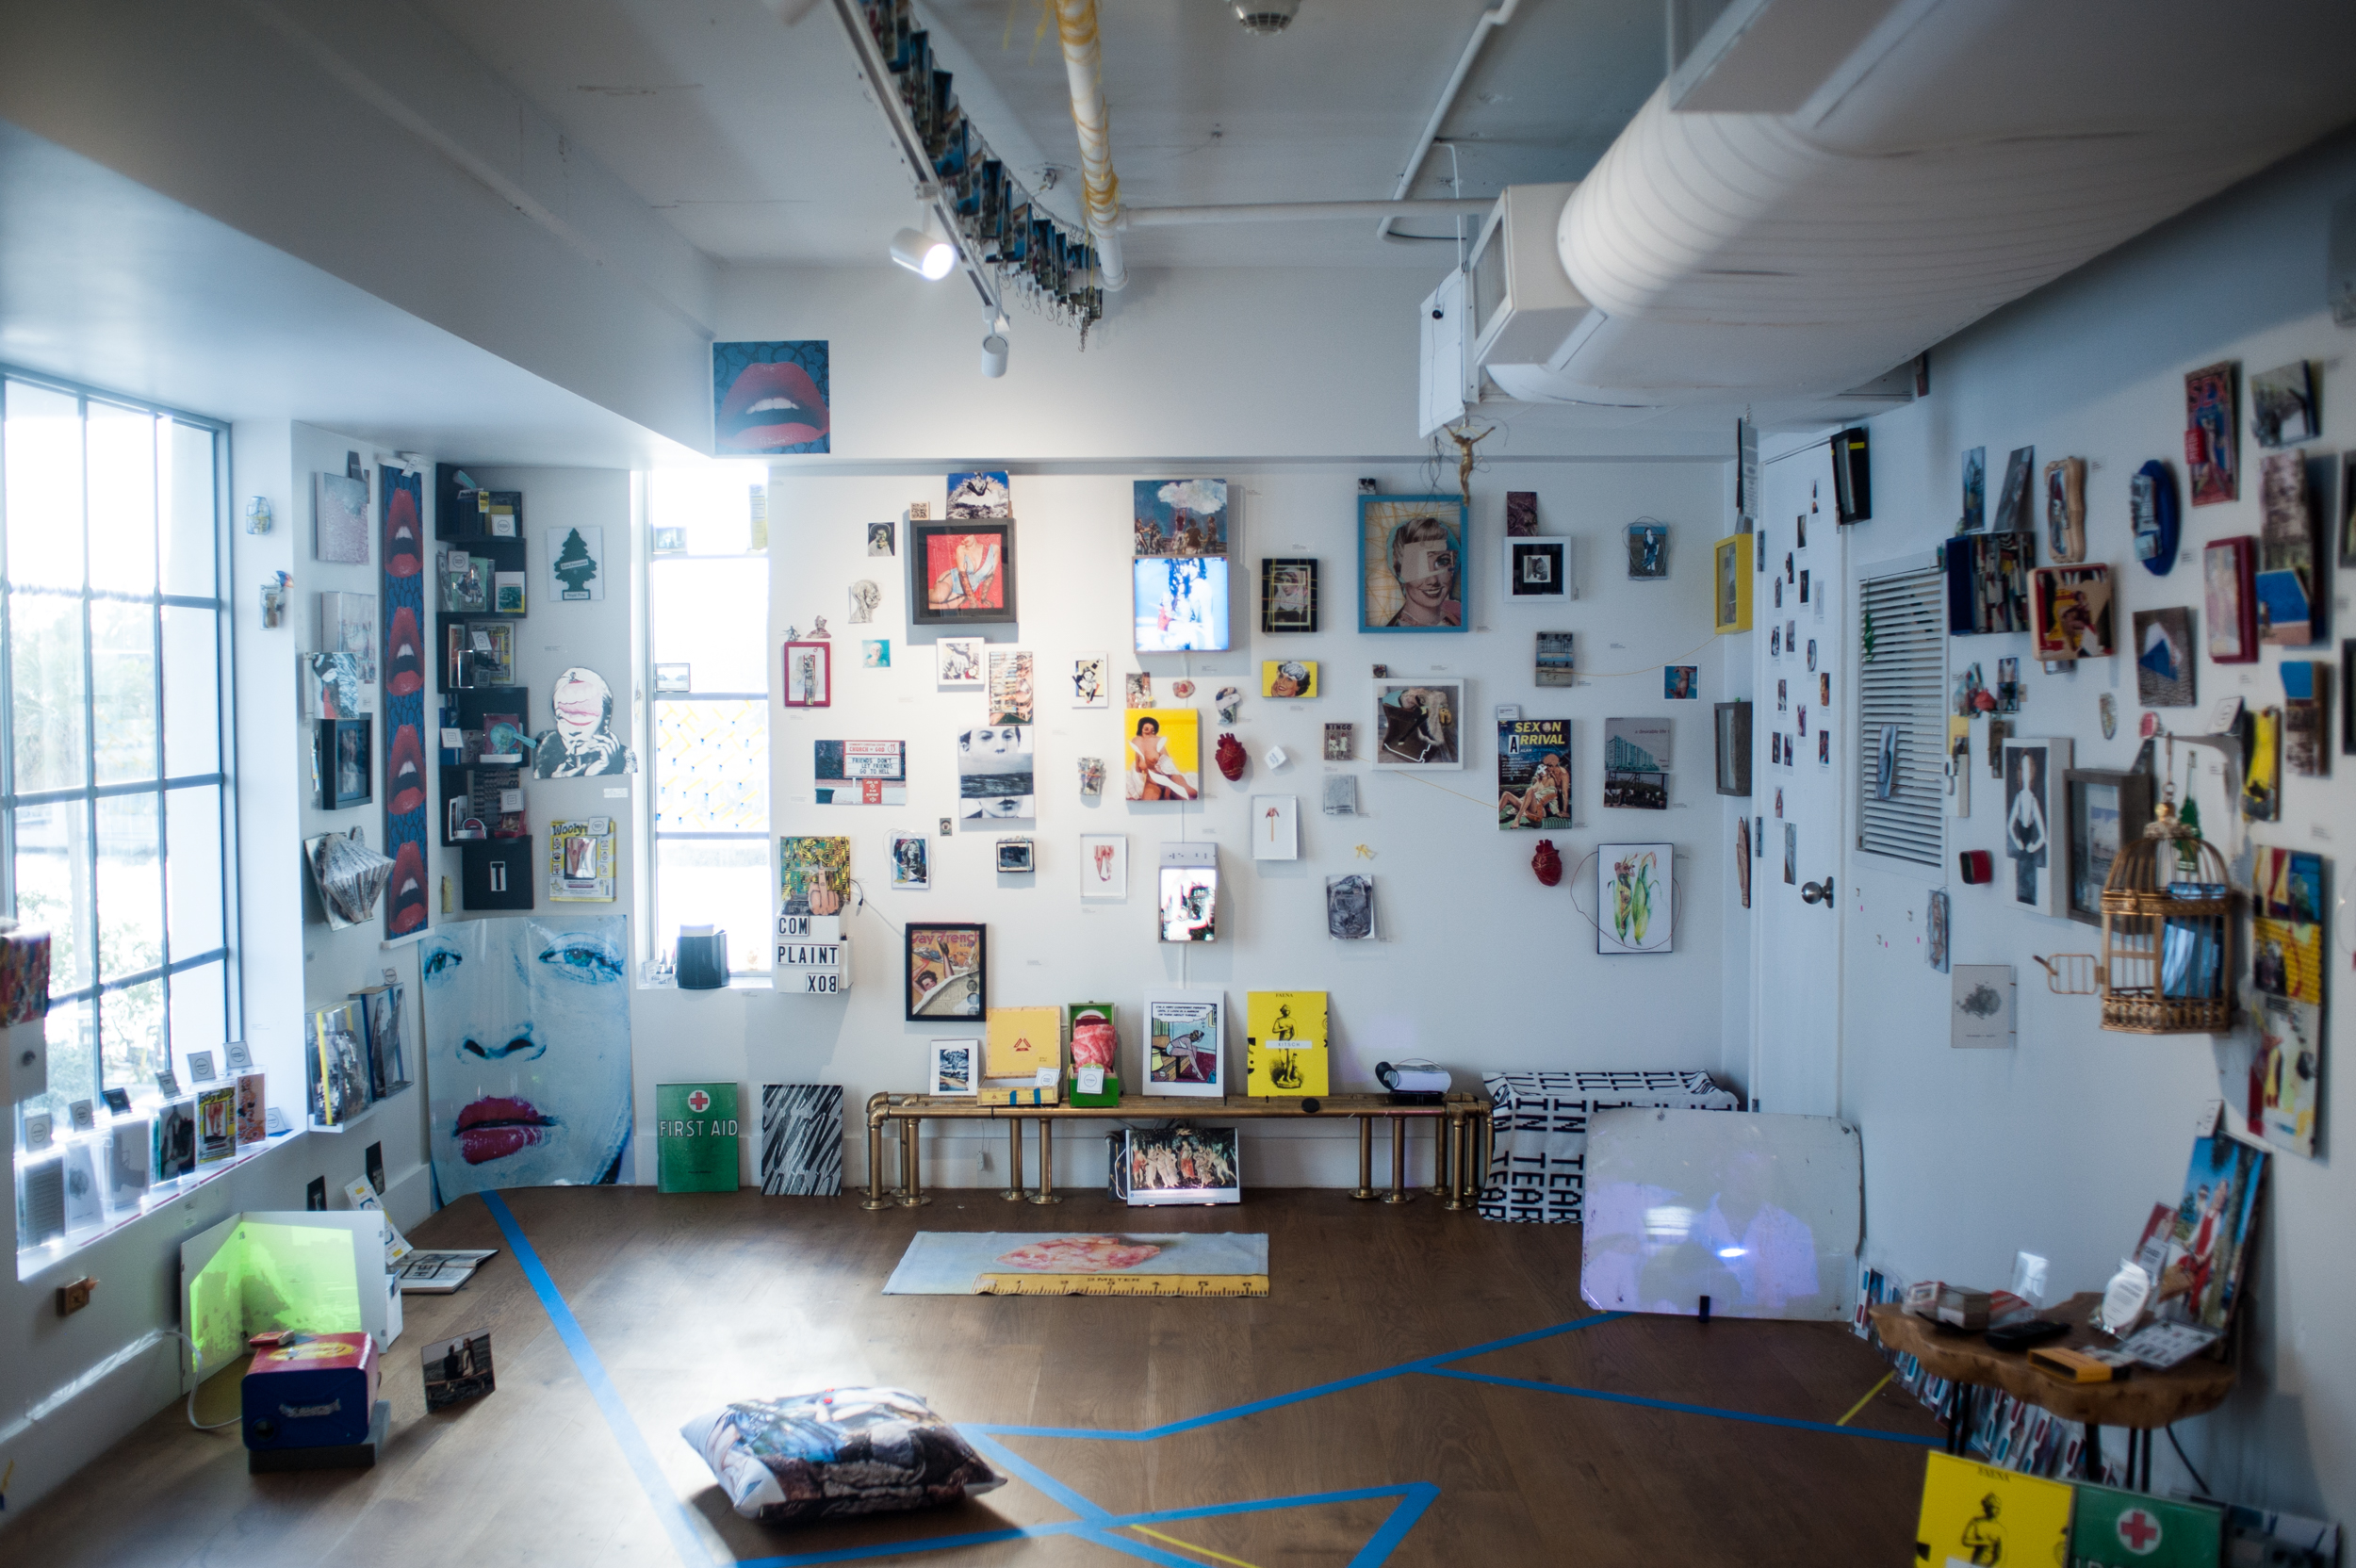 Faena-Exhibition-Images-21.jpg